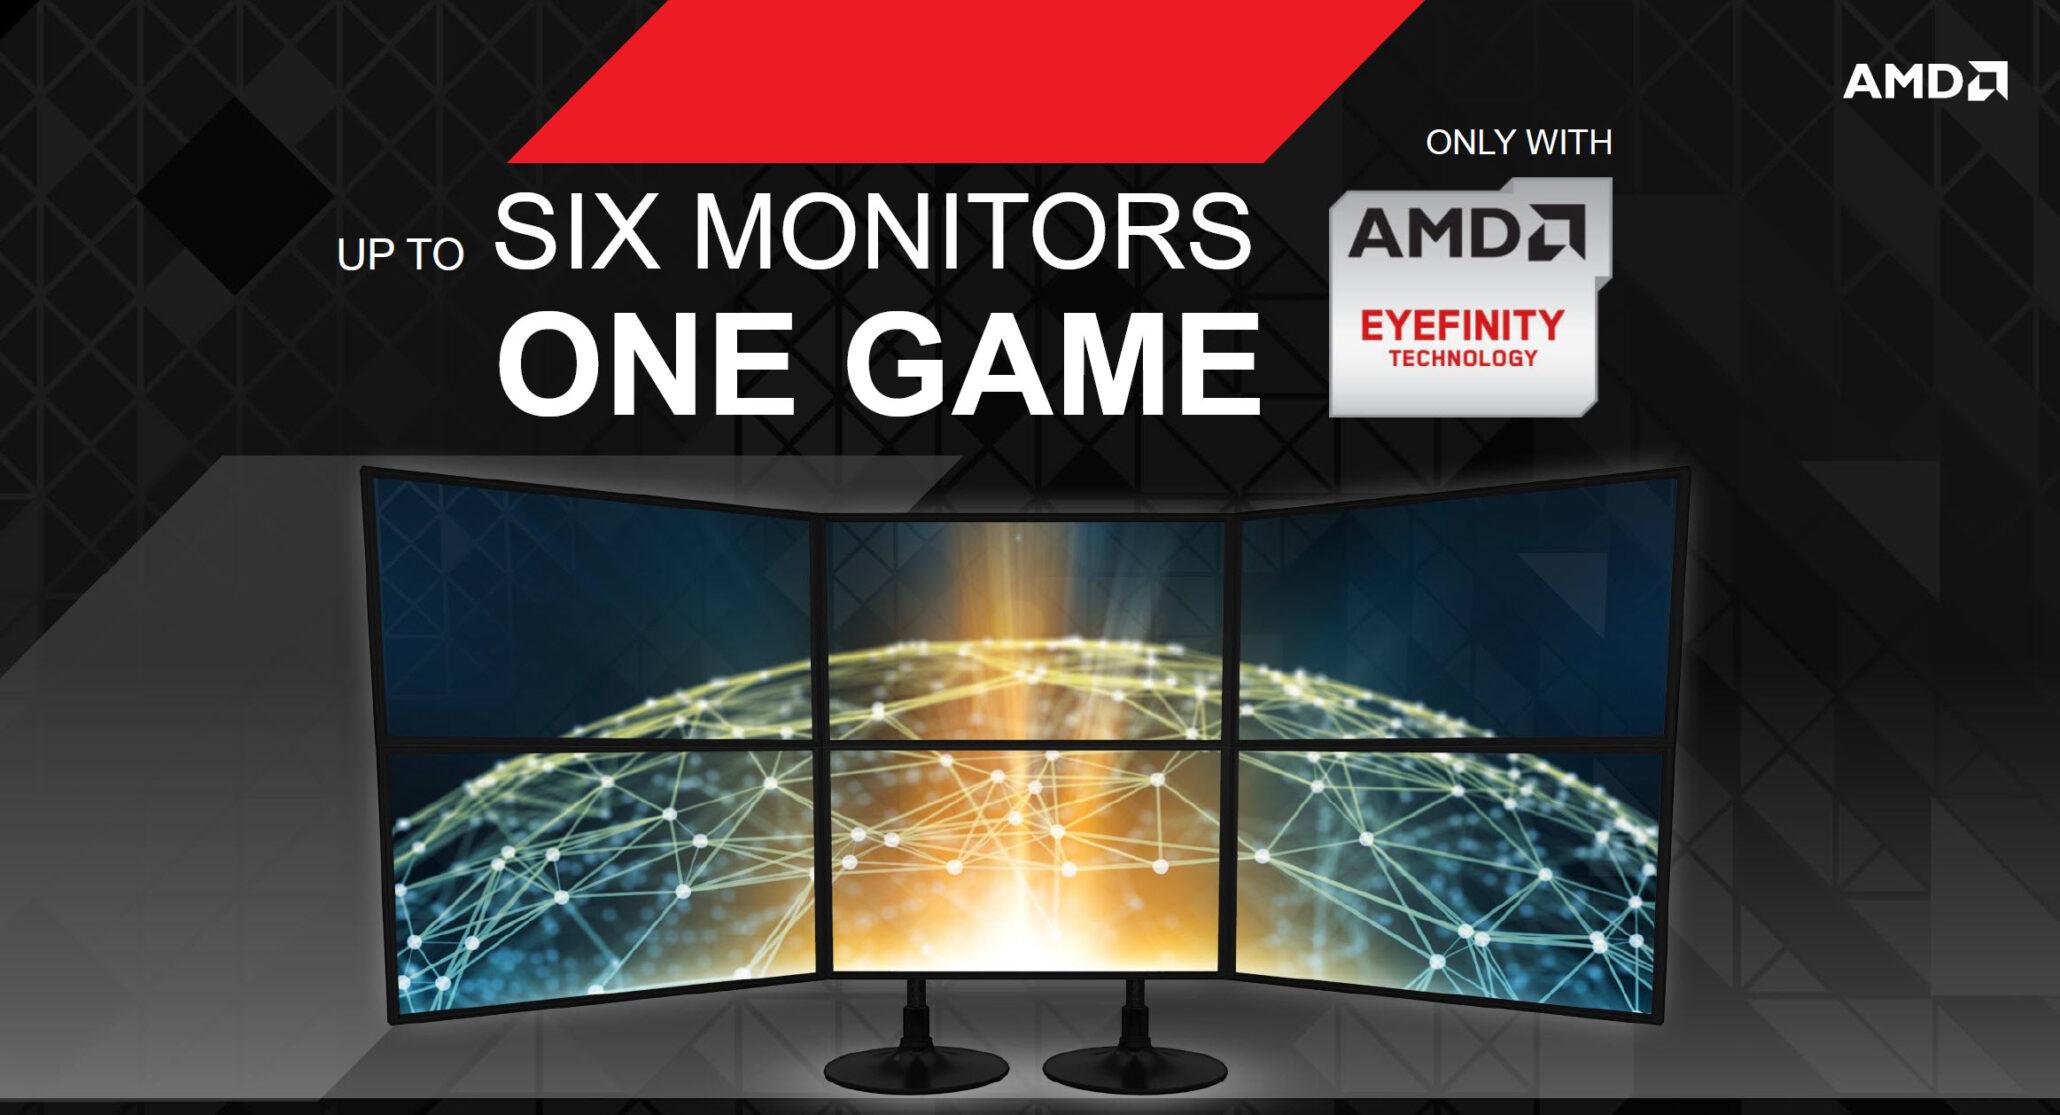 amd-eyefinity-technology